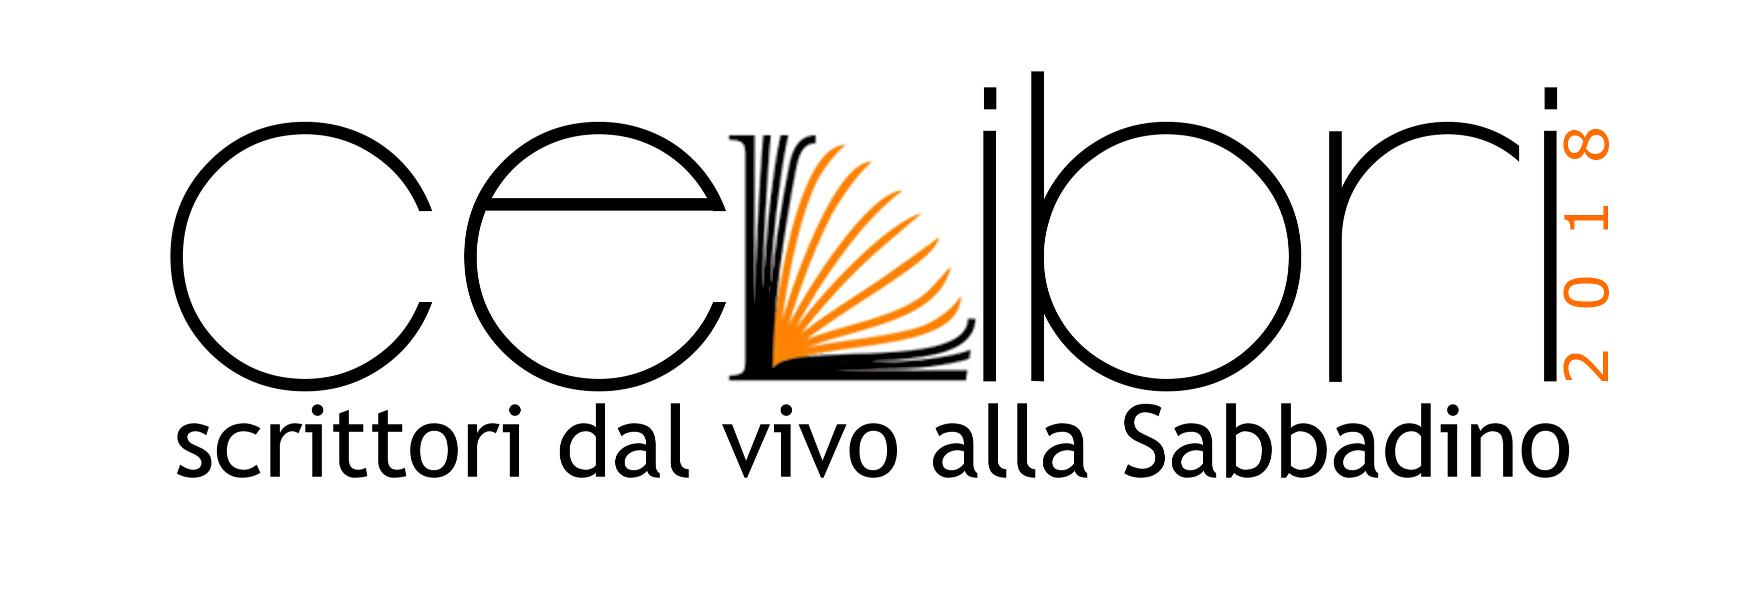 celibri_logo_2018_web